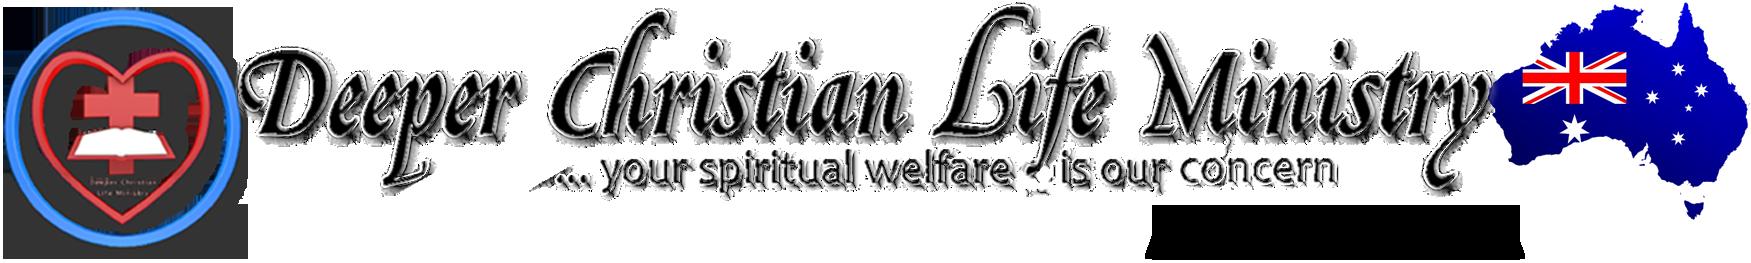 Deeper Christian Life Ministry Australia